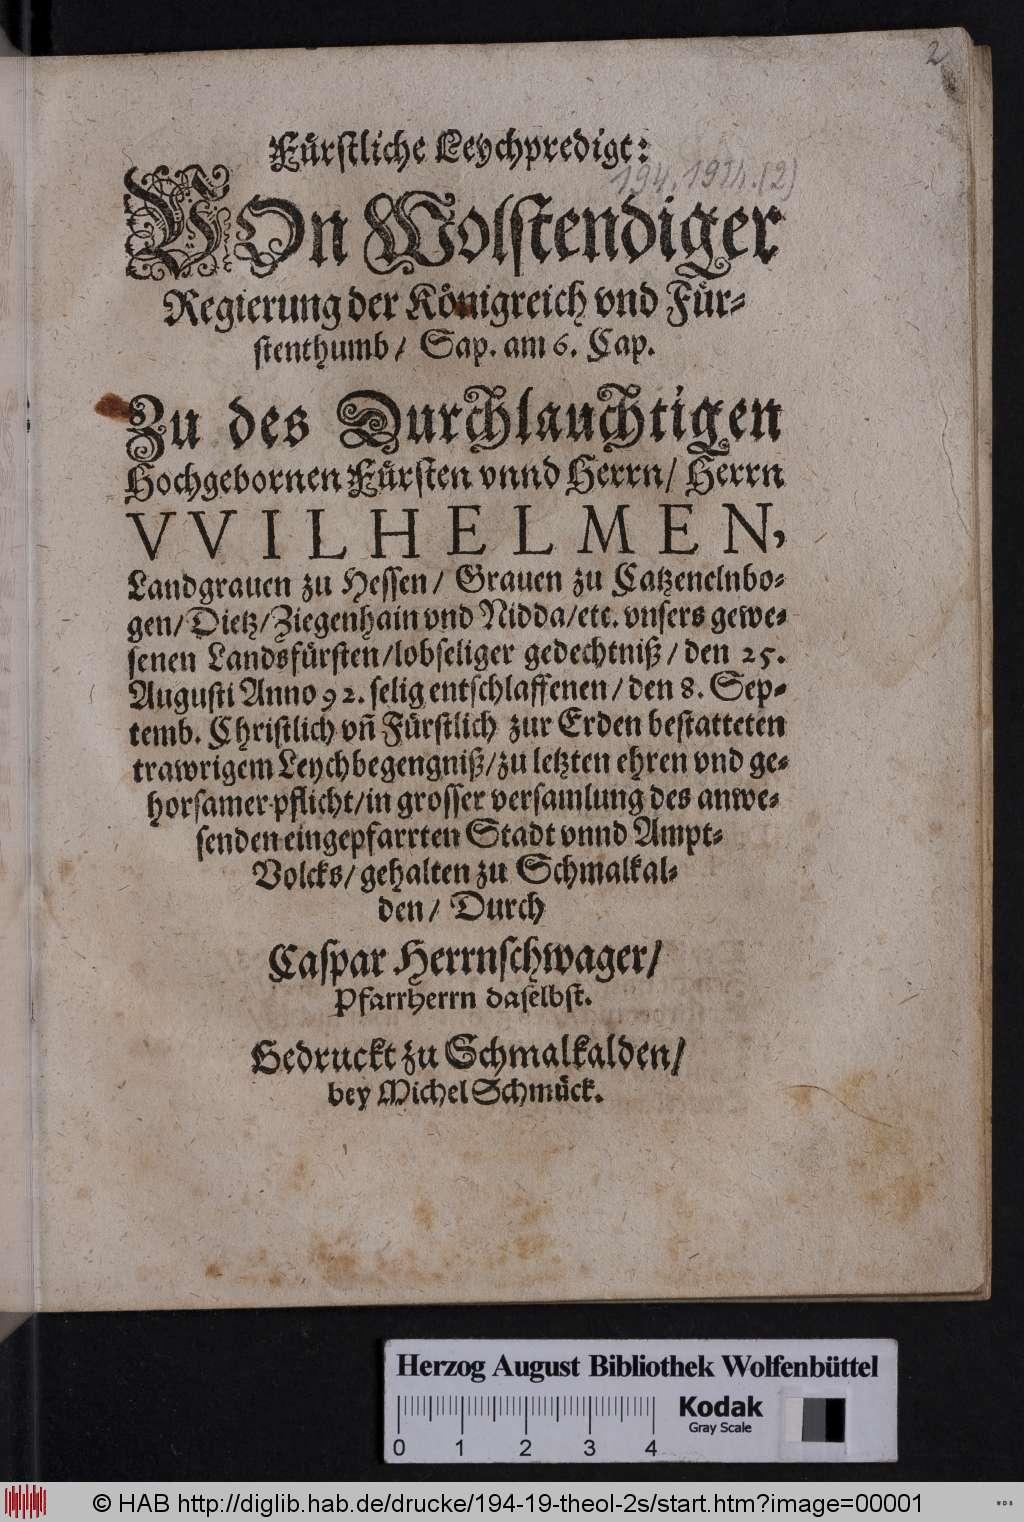 http://diglib.hab.de/drucke/194-19-theol-2s/00001.jpg